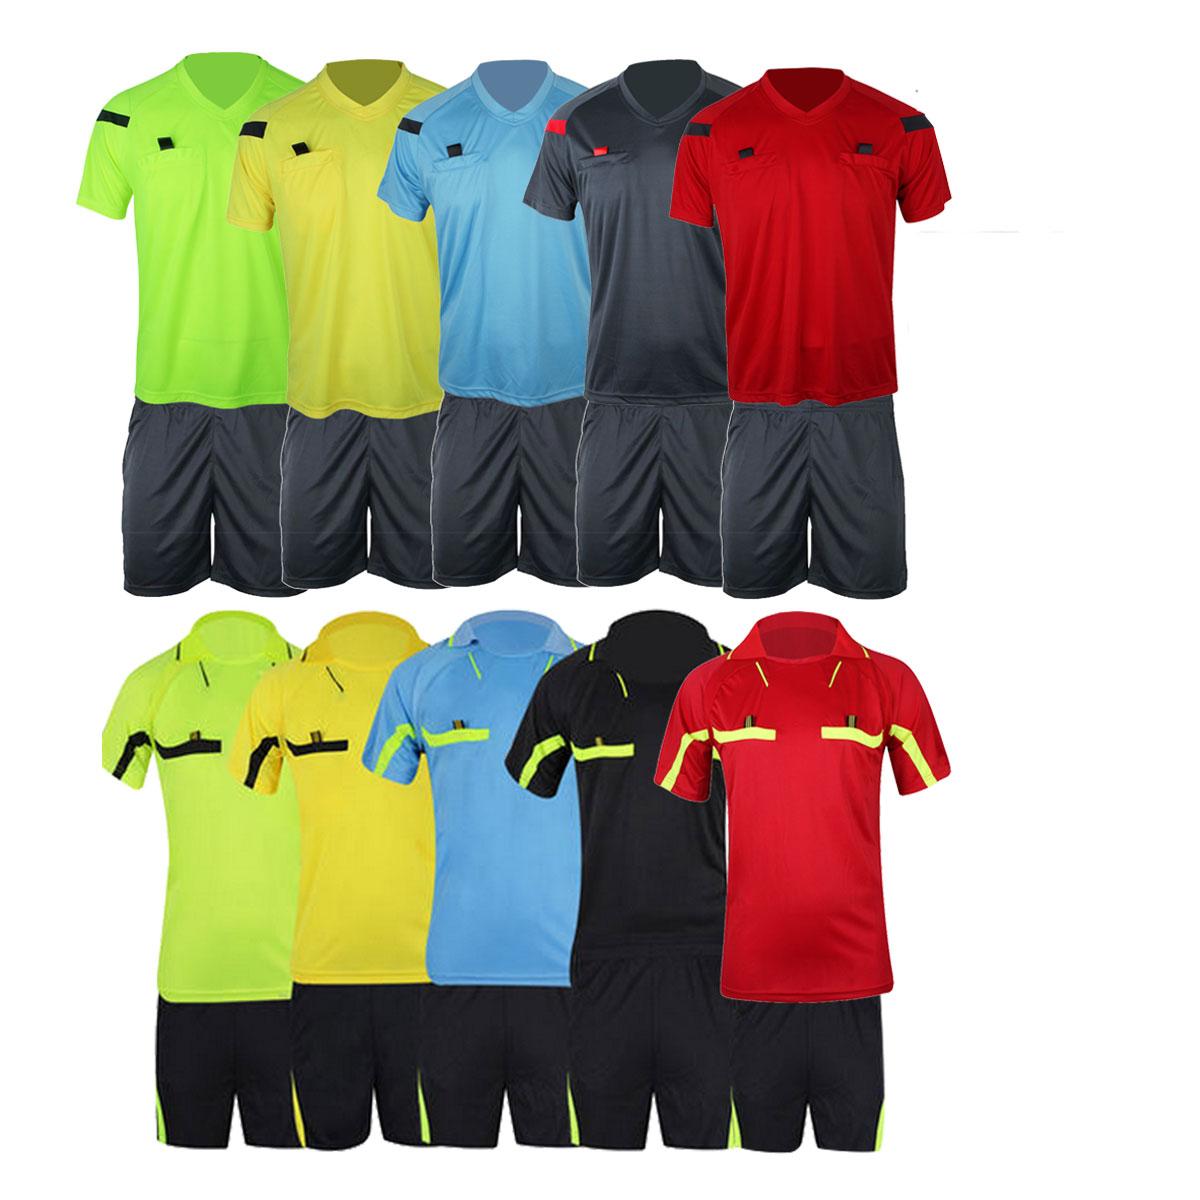 Uniformi Calcio Arbitro